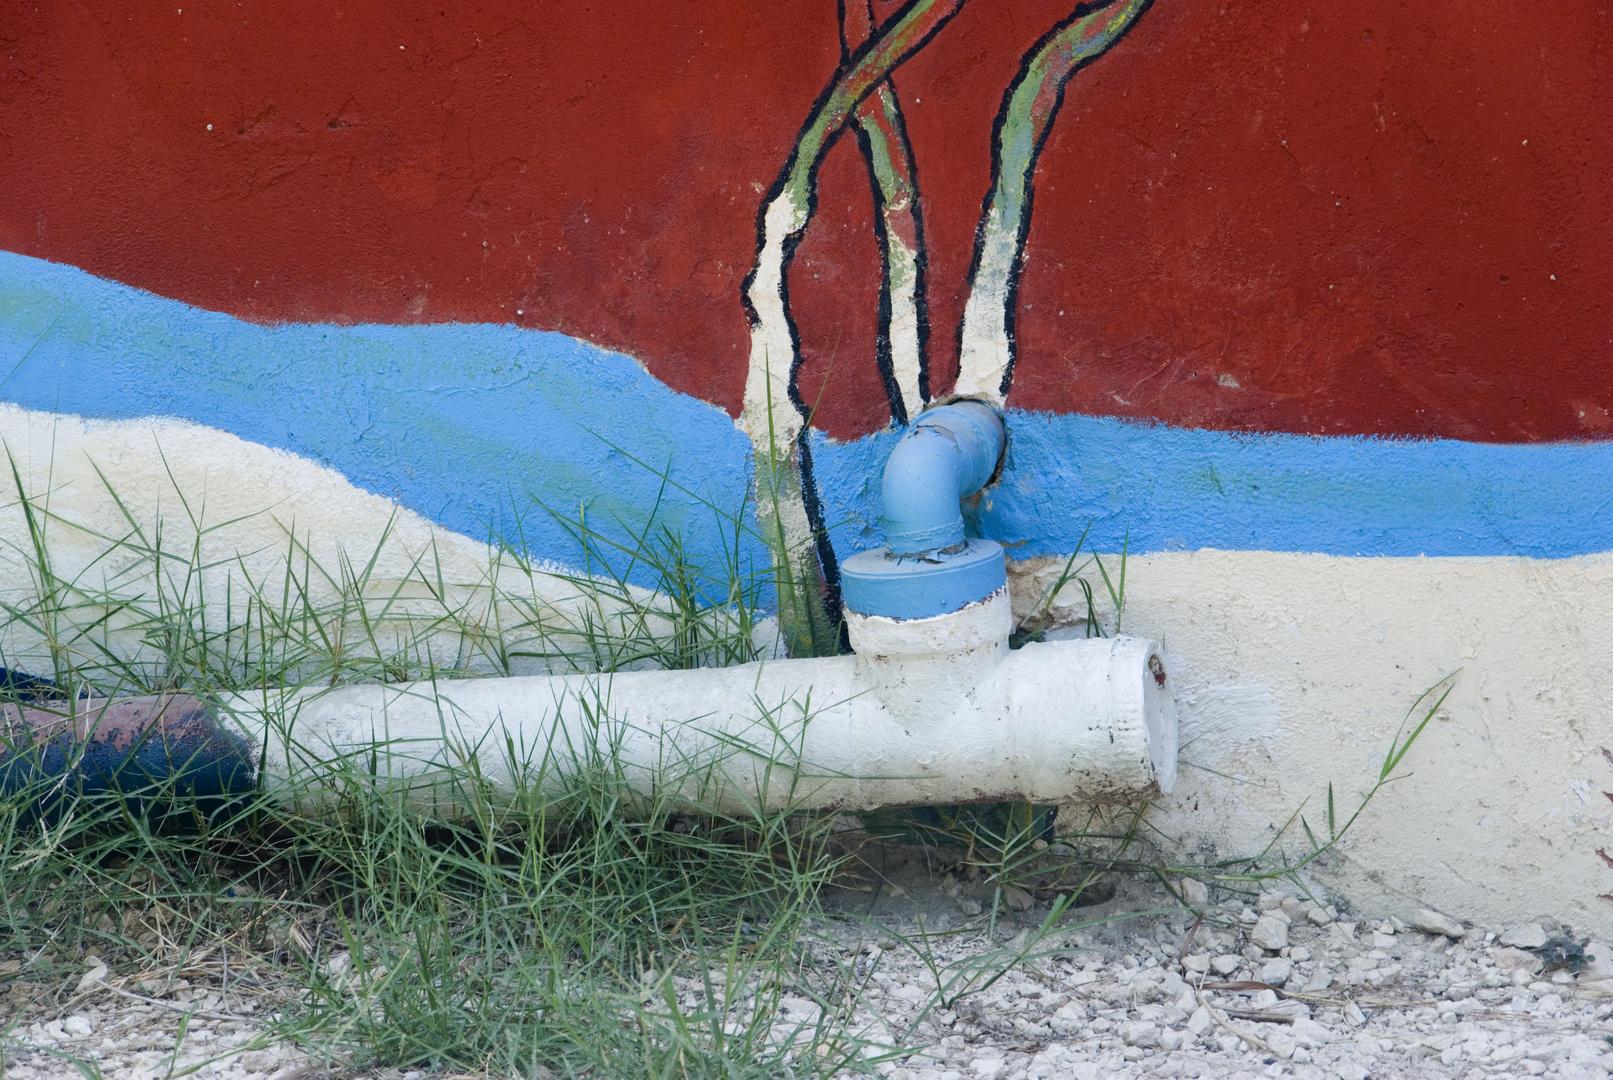 Grieschiche Wasserleitung